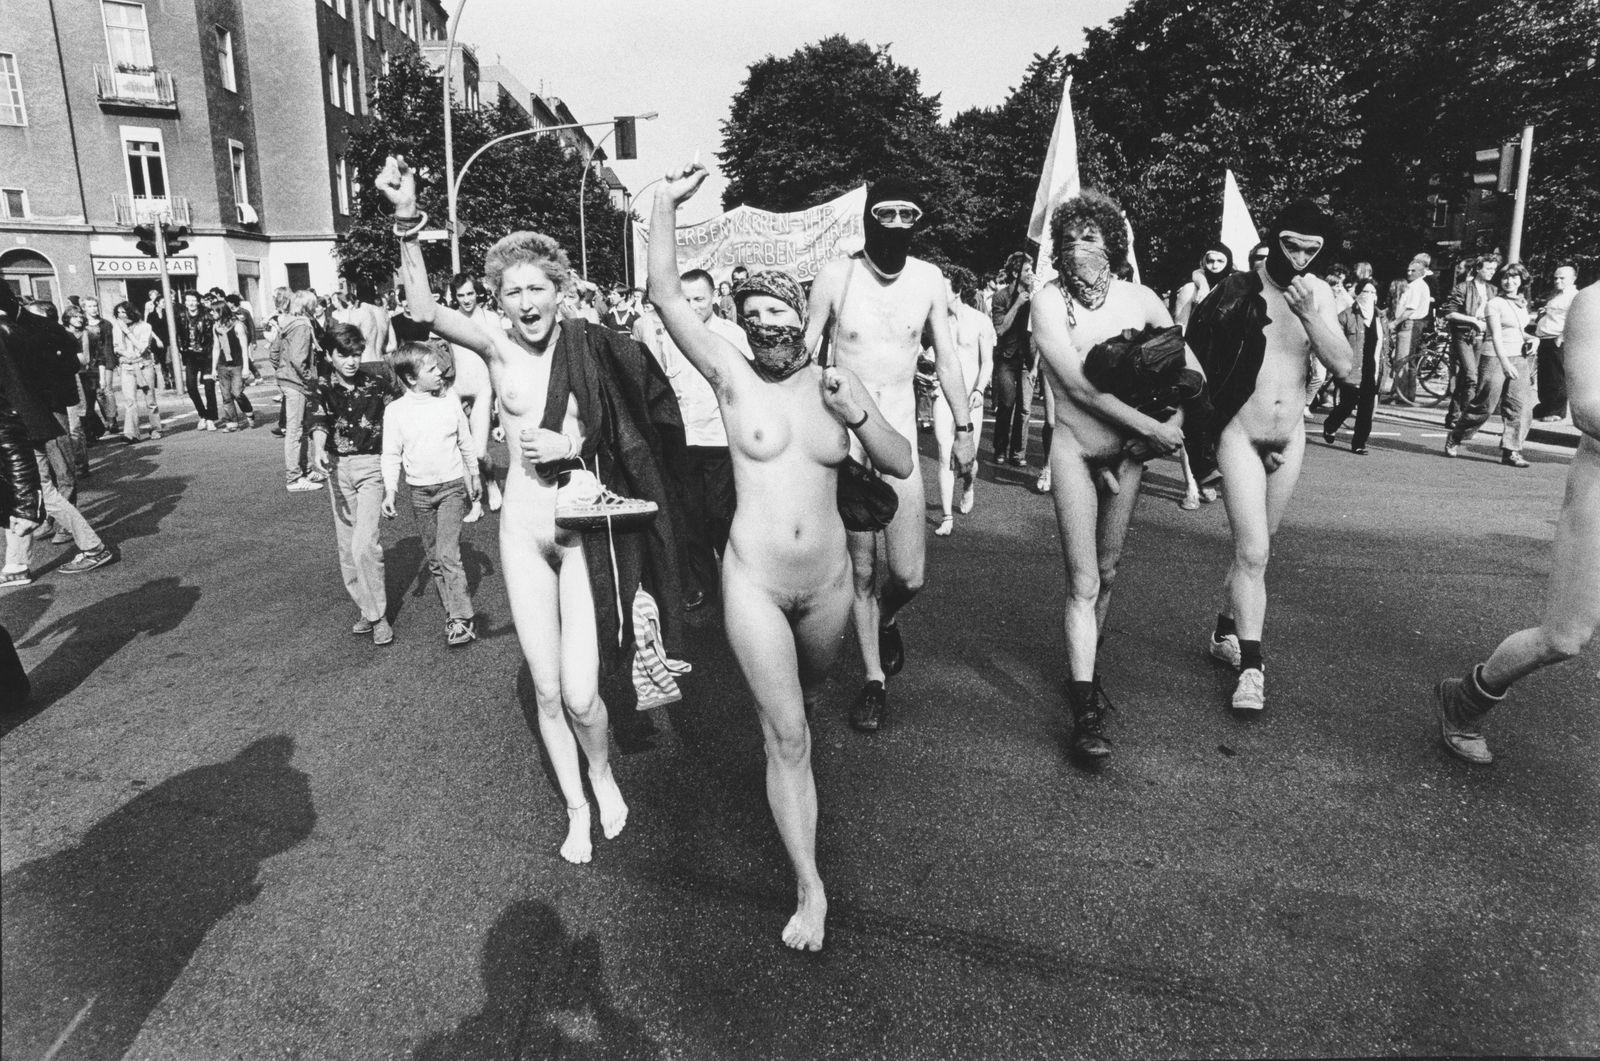 Berlin, nackte Demonstranten demonstrieren gegen das Vermummungsverbot